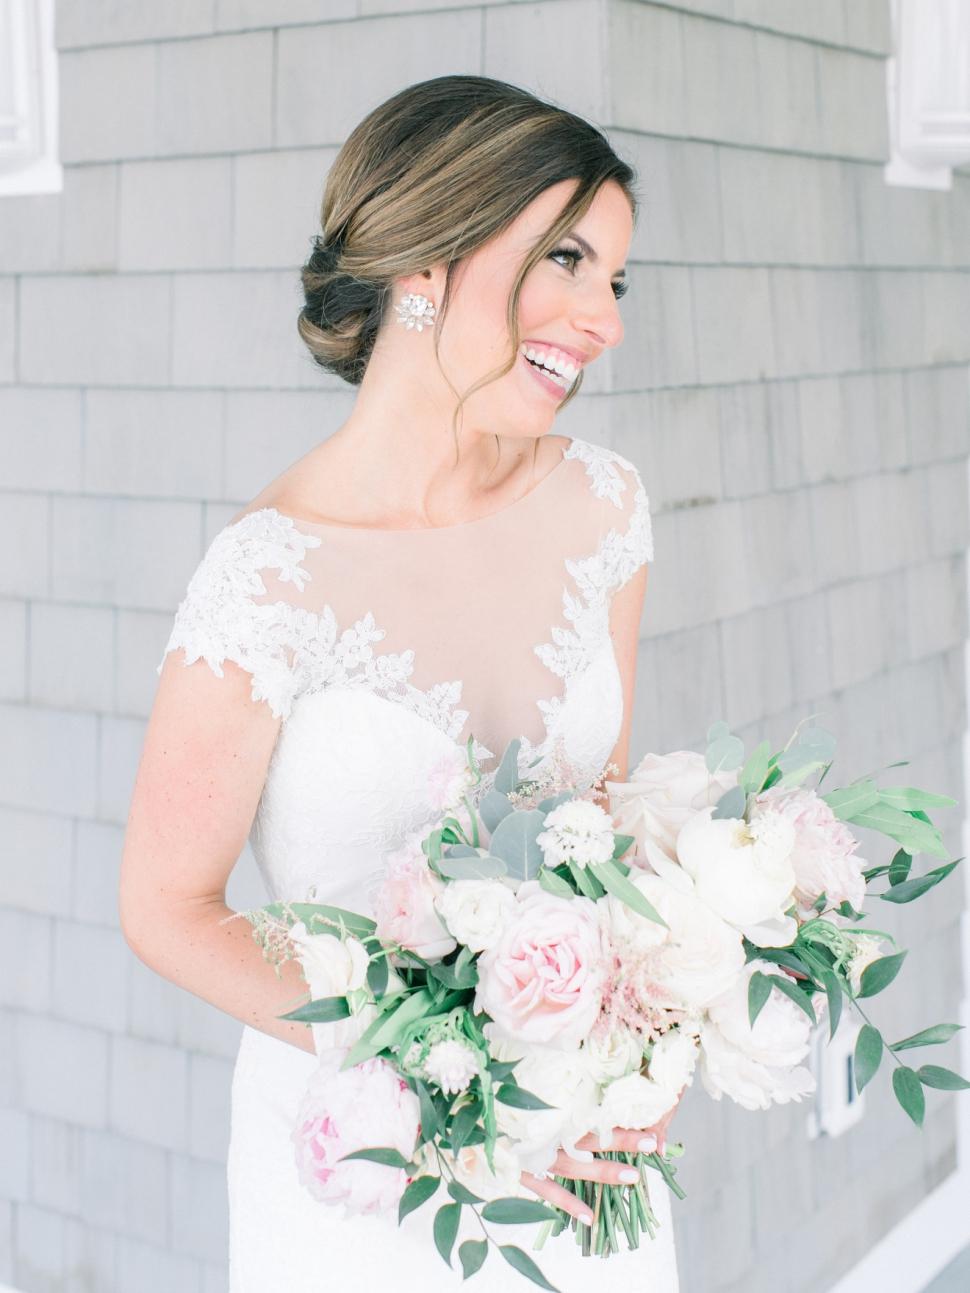 Connecticut-Wedding-Photographer-Cassi-Claire-Shorehaven-Golf-Club-Wedding_23.jpg